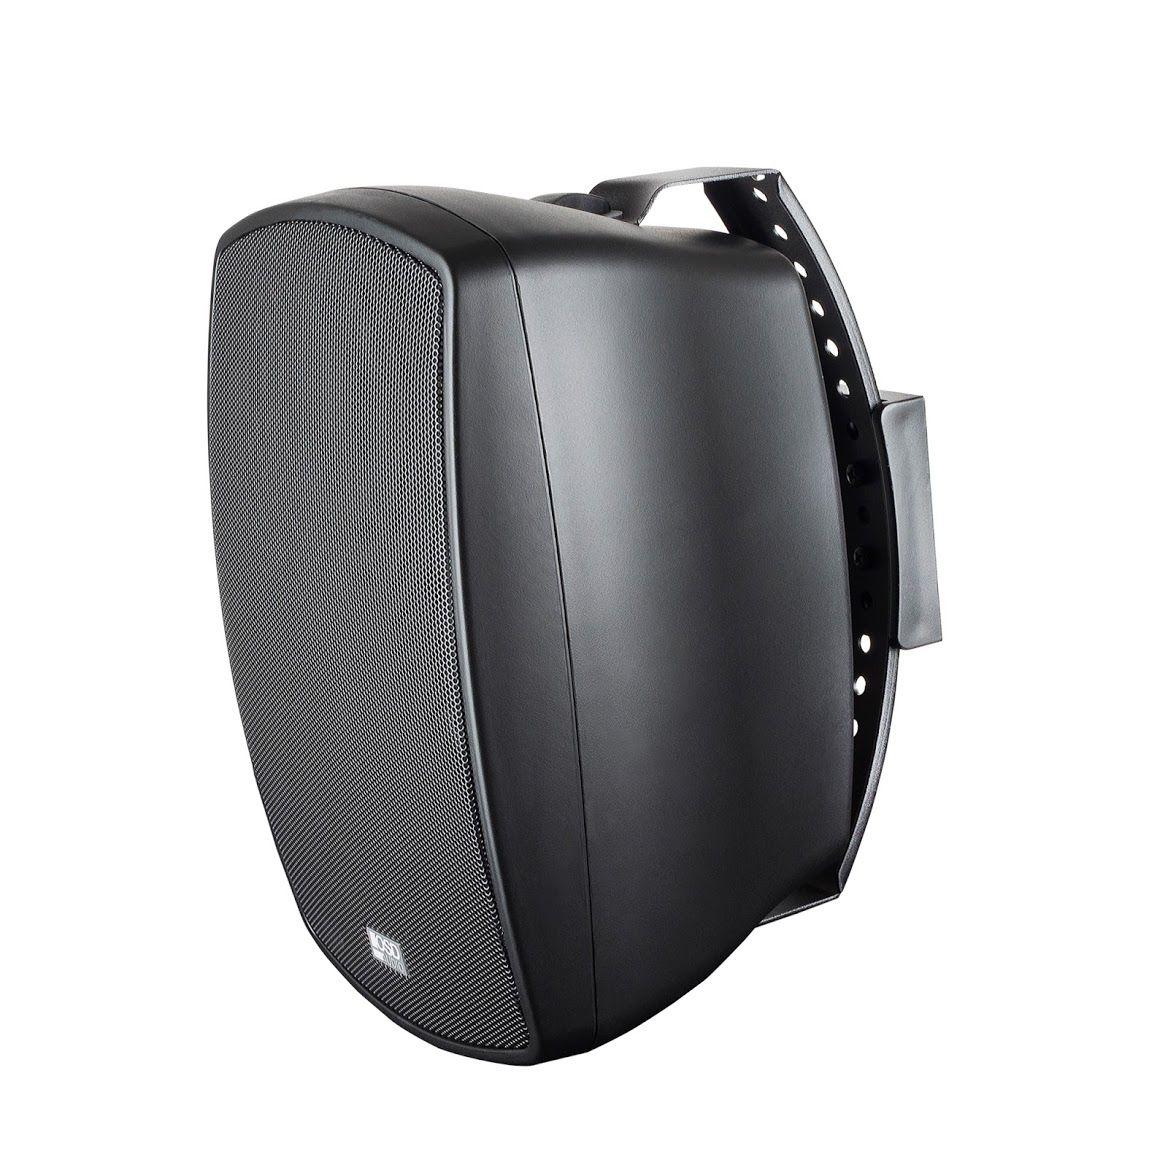 5 25 Bluetooth Outdoor Patio Speaker Pair W Waterproof Power Supply Black Or White Btp525 With Images Speaker Bluetooth Weather Resistant